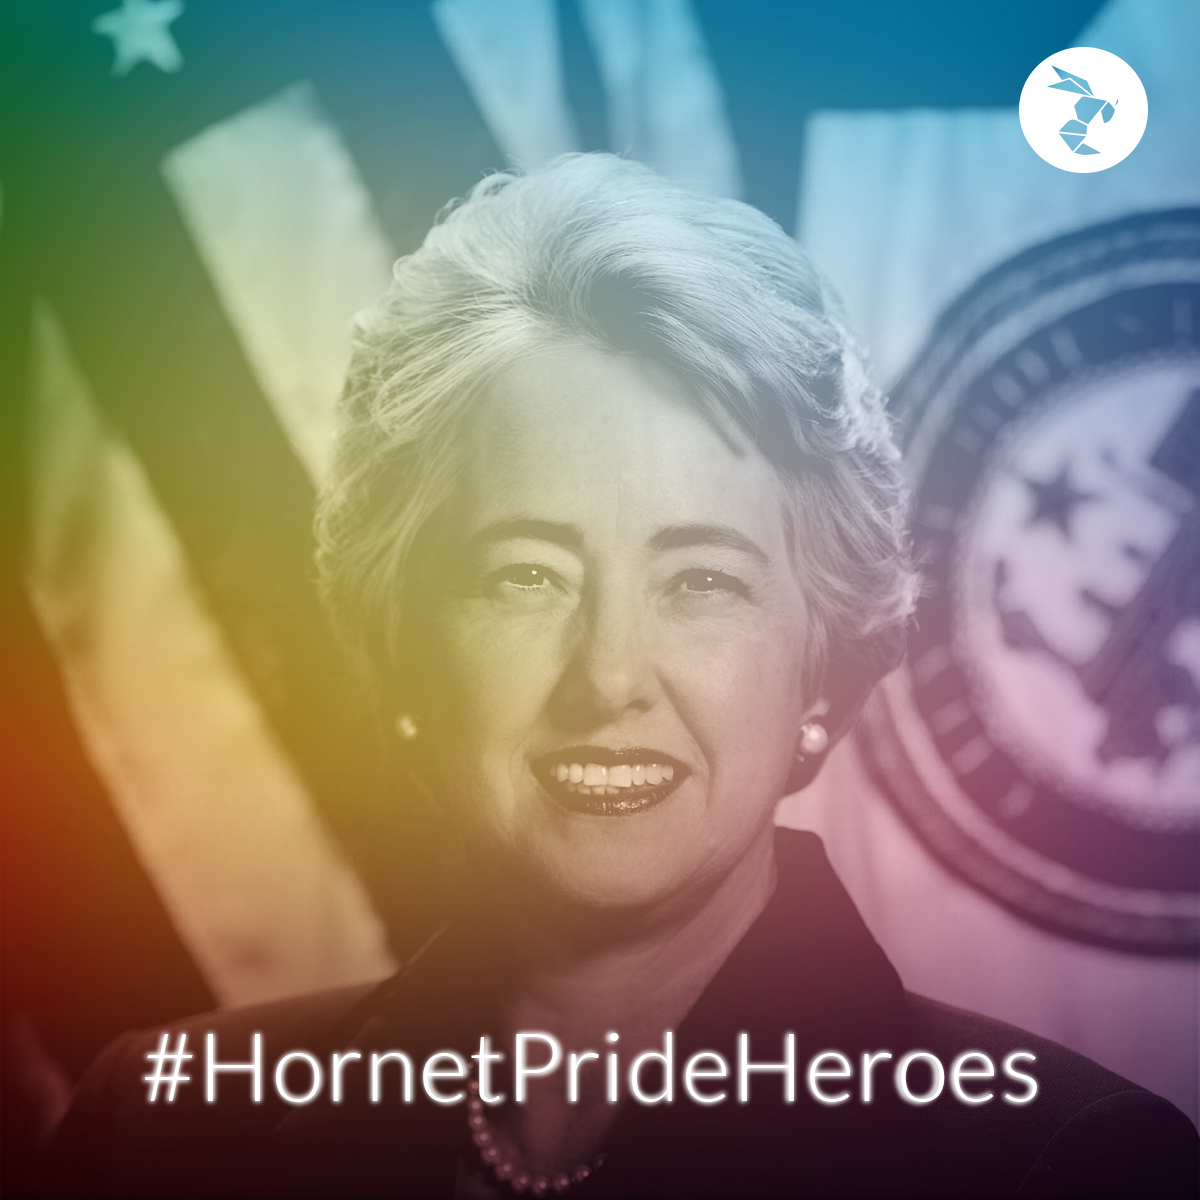 Hornet Pride Heroes annise parker